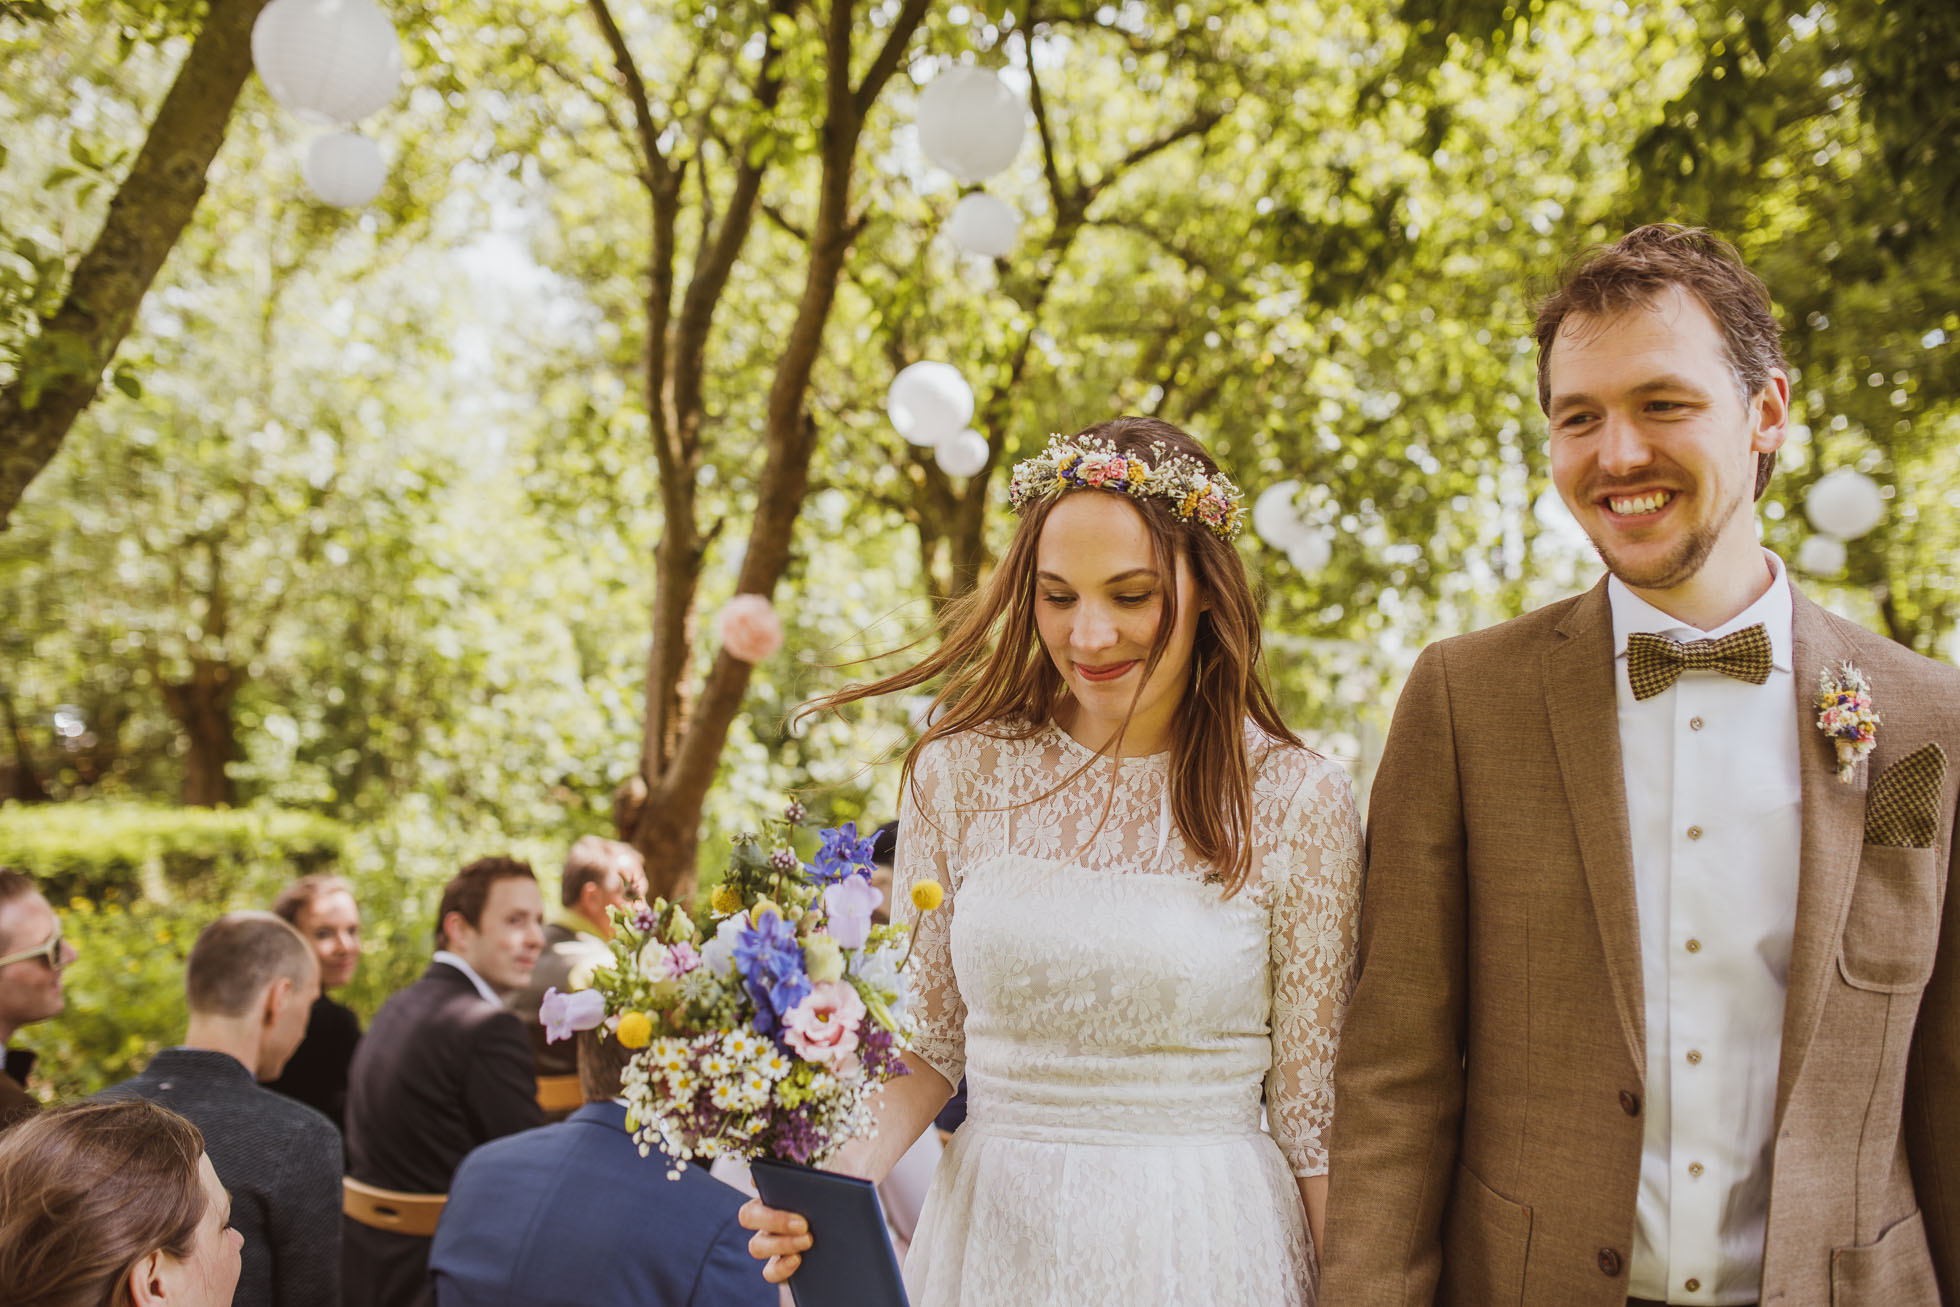 utrecht-wedding-photographer-74.jpg